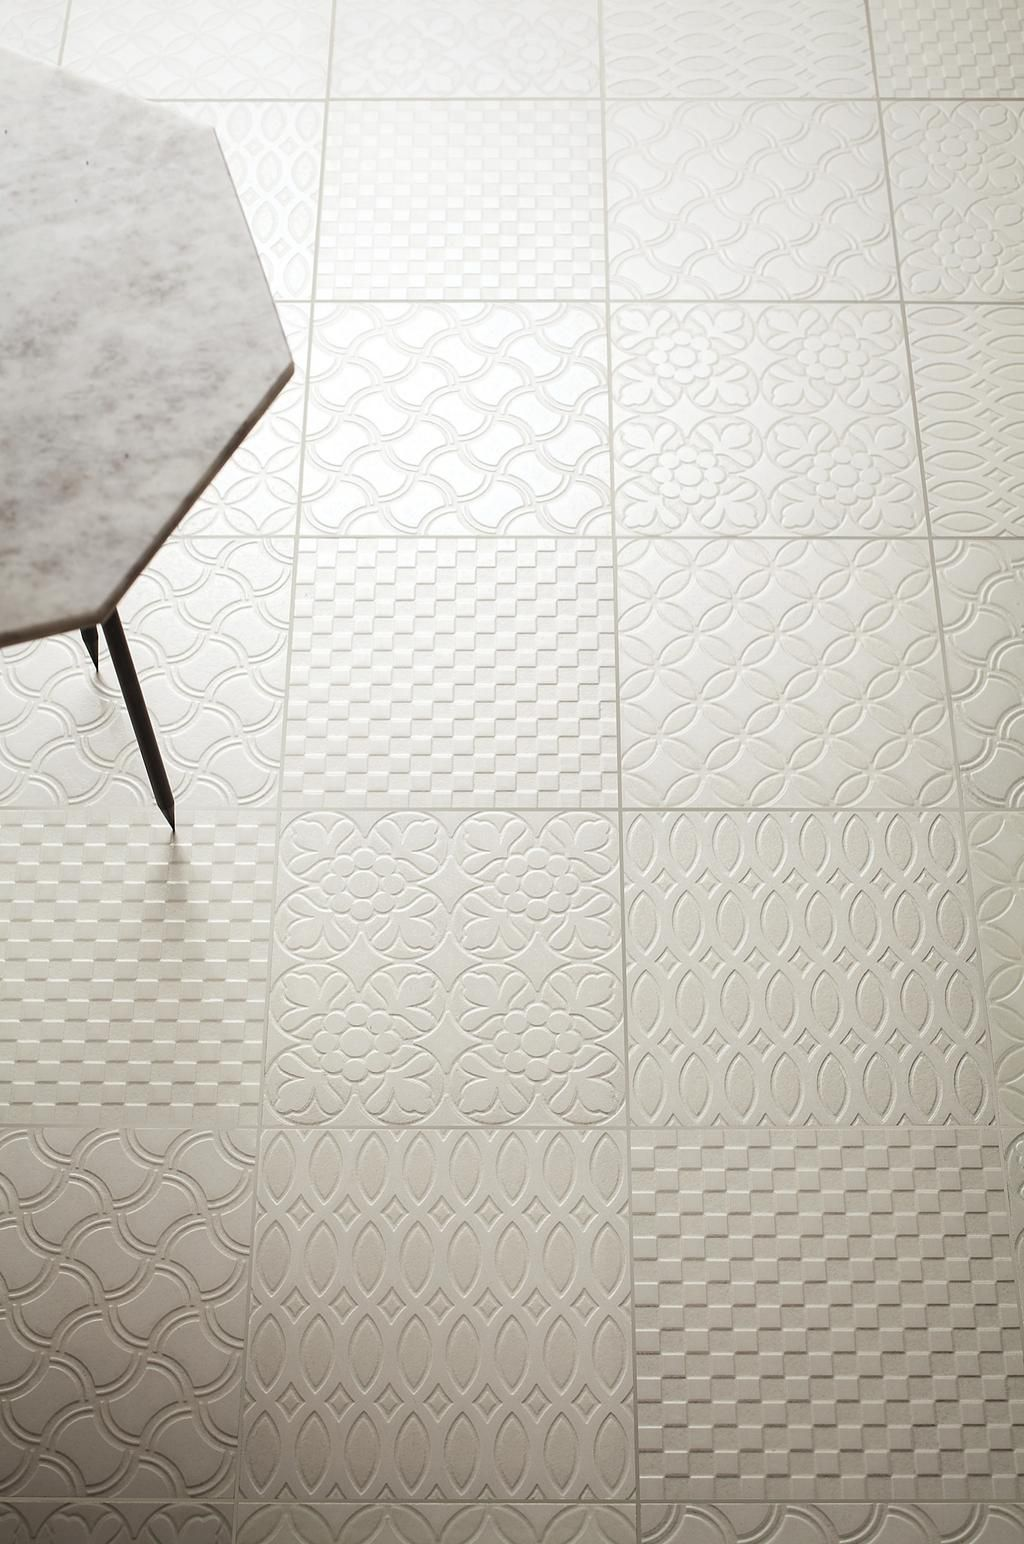 johann paquelier on carrelage sol carrelage et relief. Black Bedroom Furniture Sets. Home Design Ideas